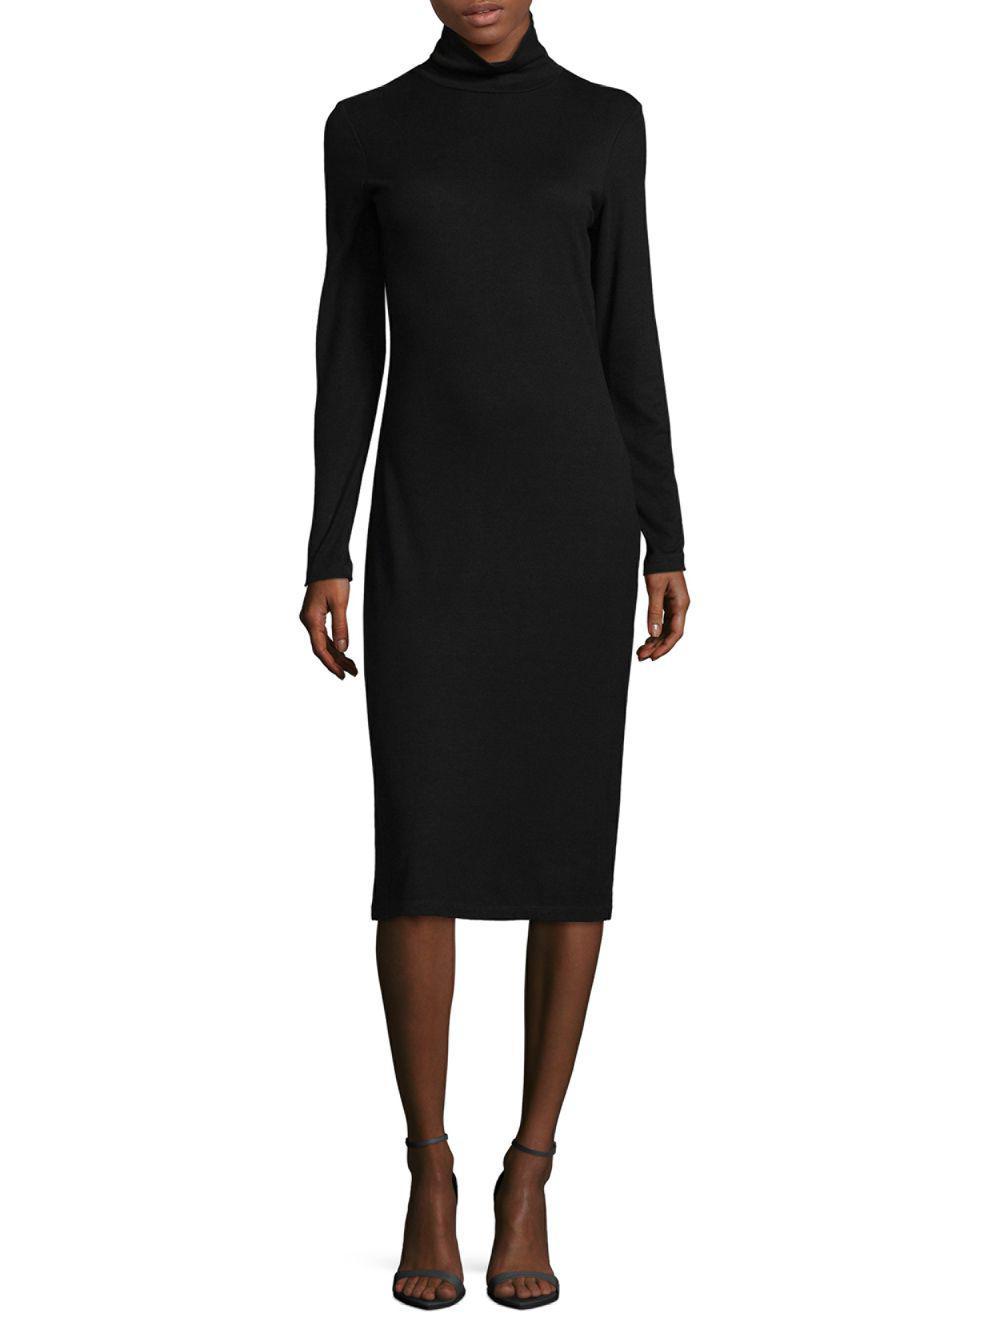 ef1911077a1b Lyst - James Perse Turtleneck Midi Dress in Black